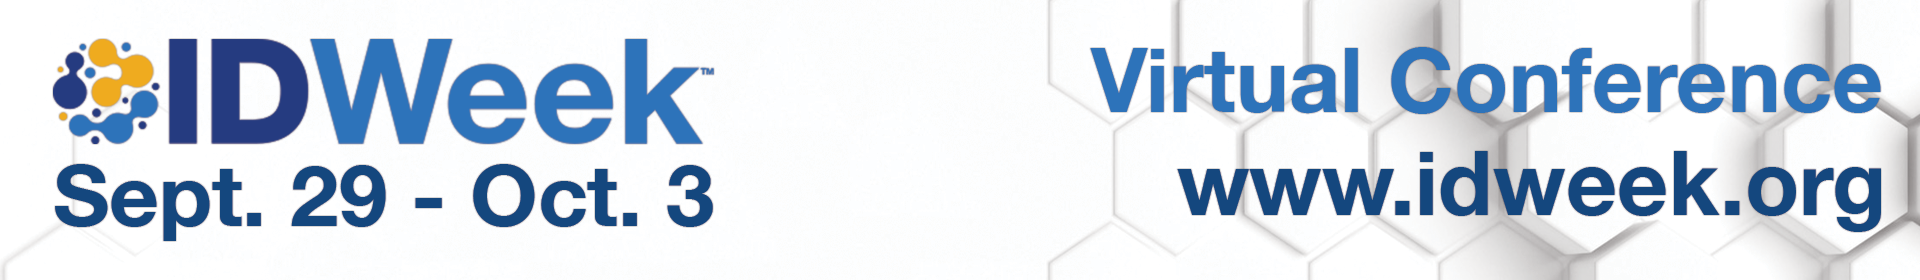 IDWeek 2021 Event Banner